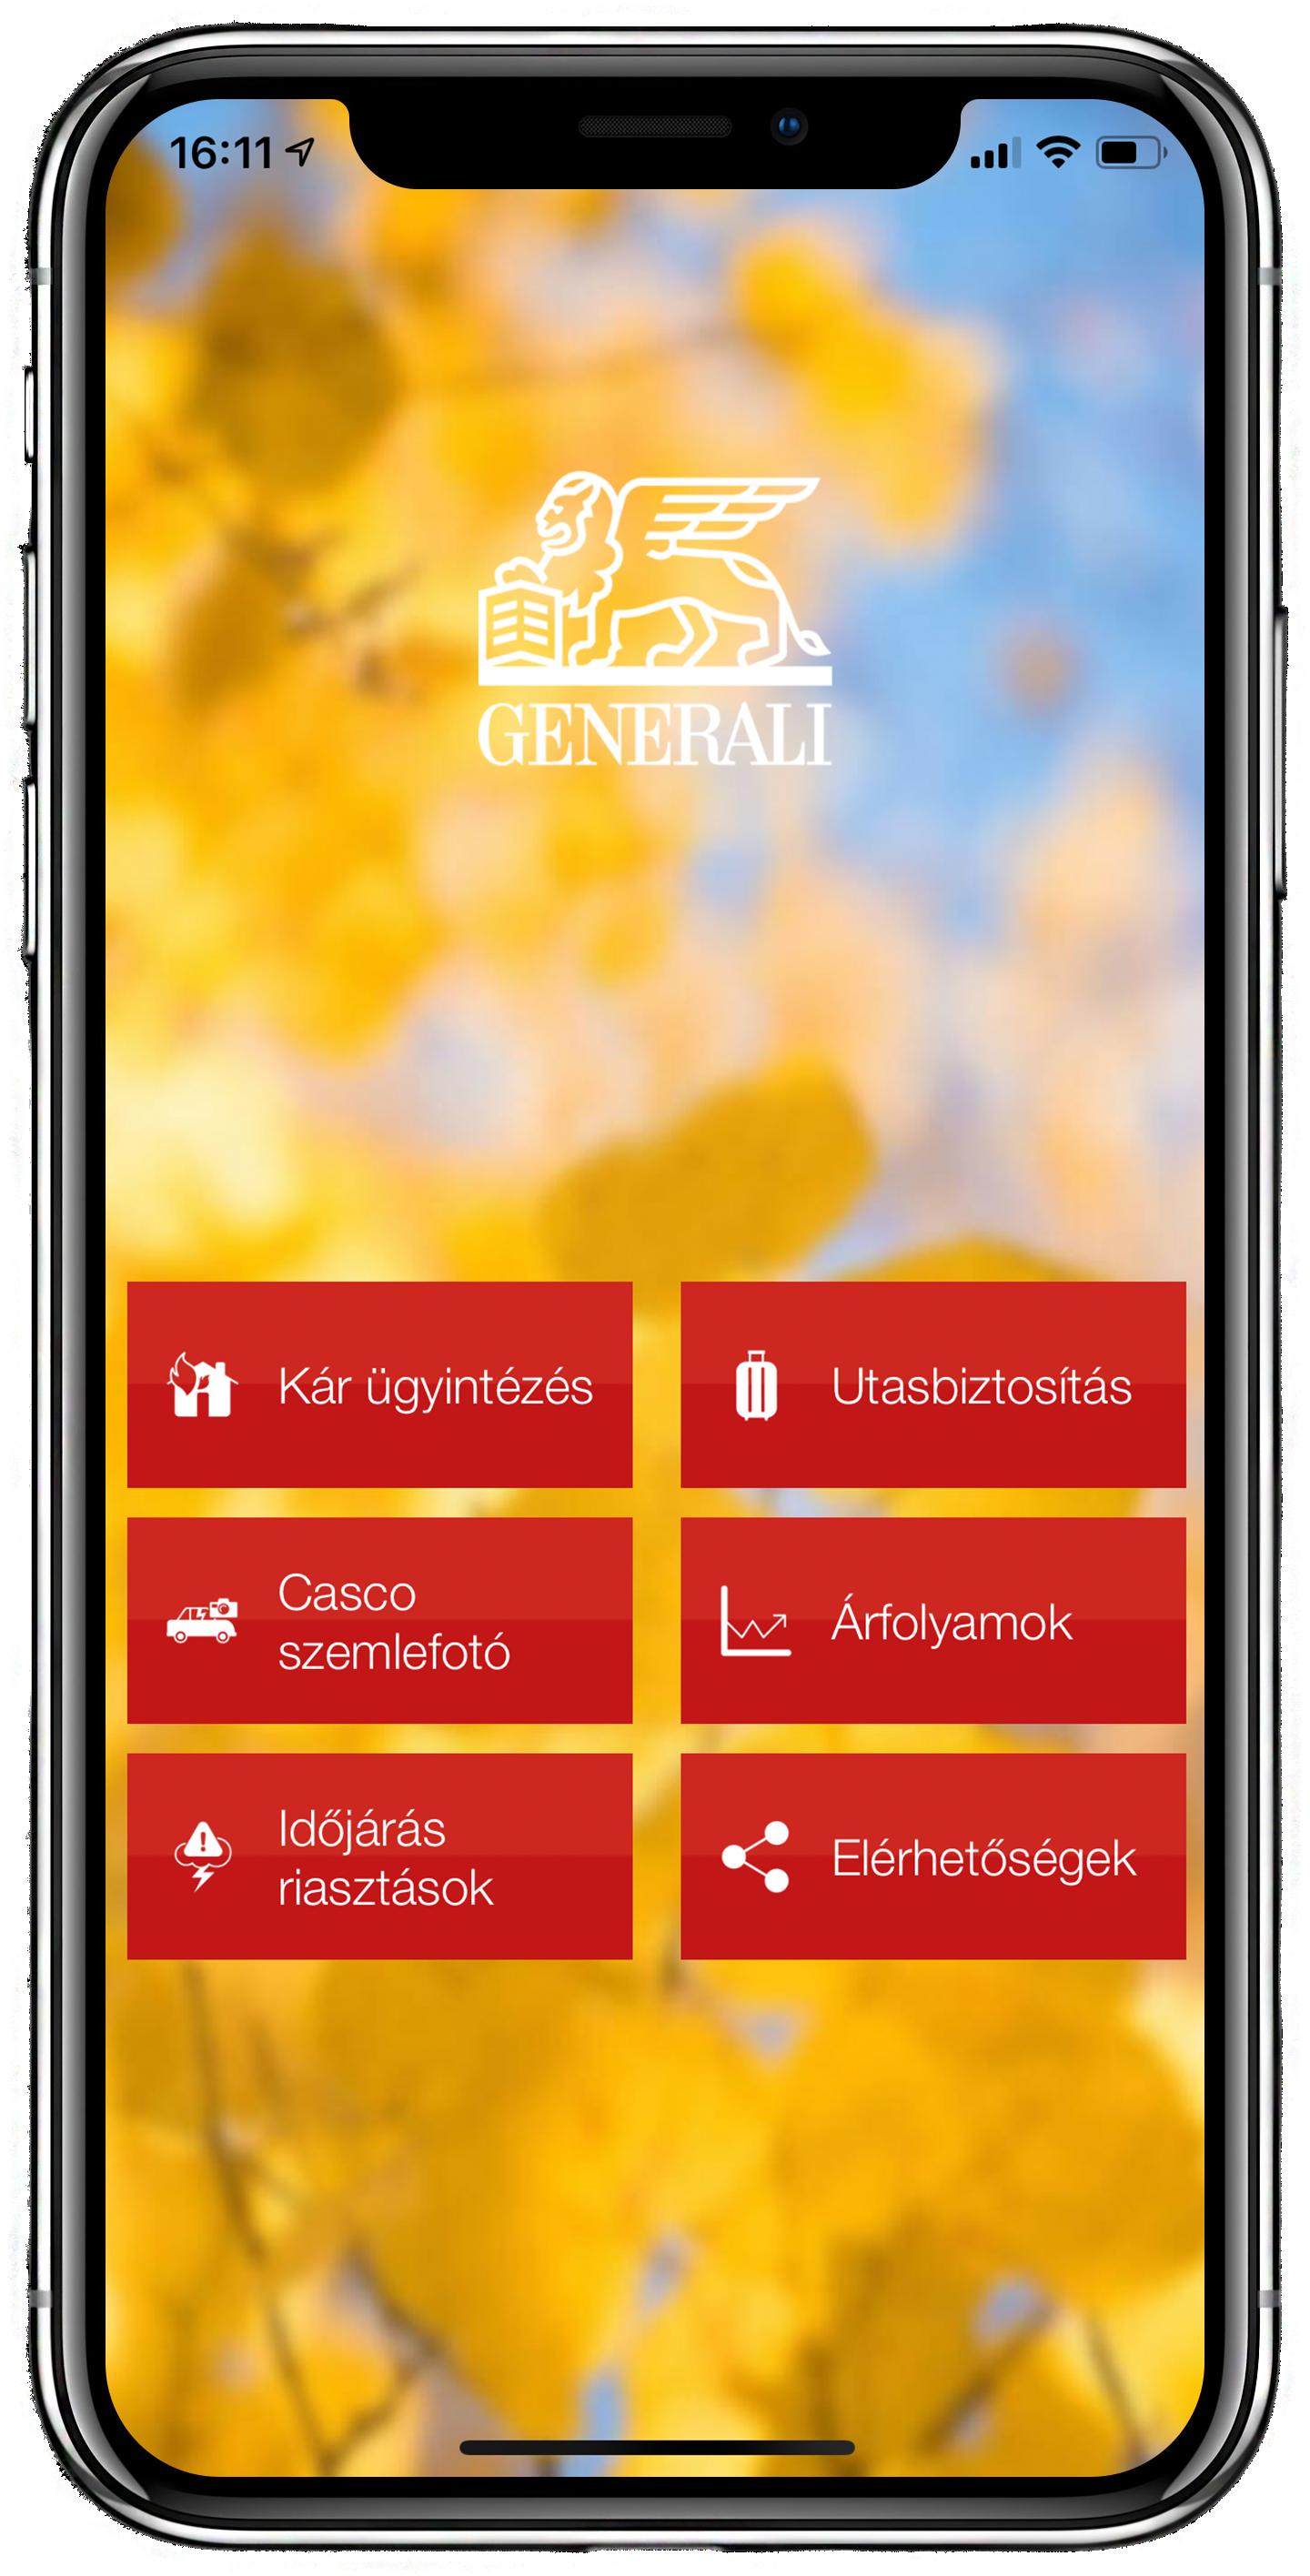 generali_up.png